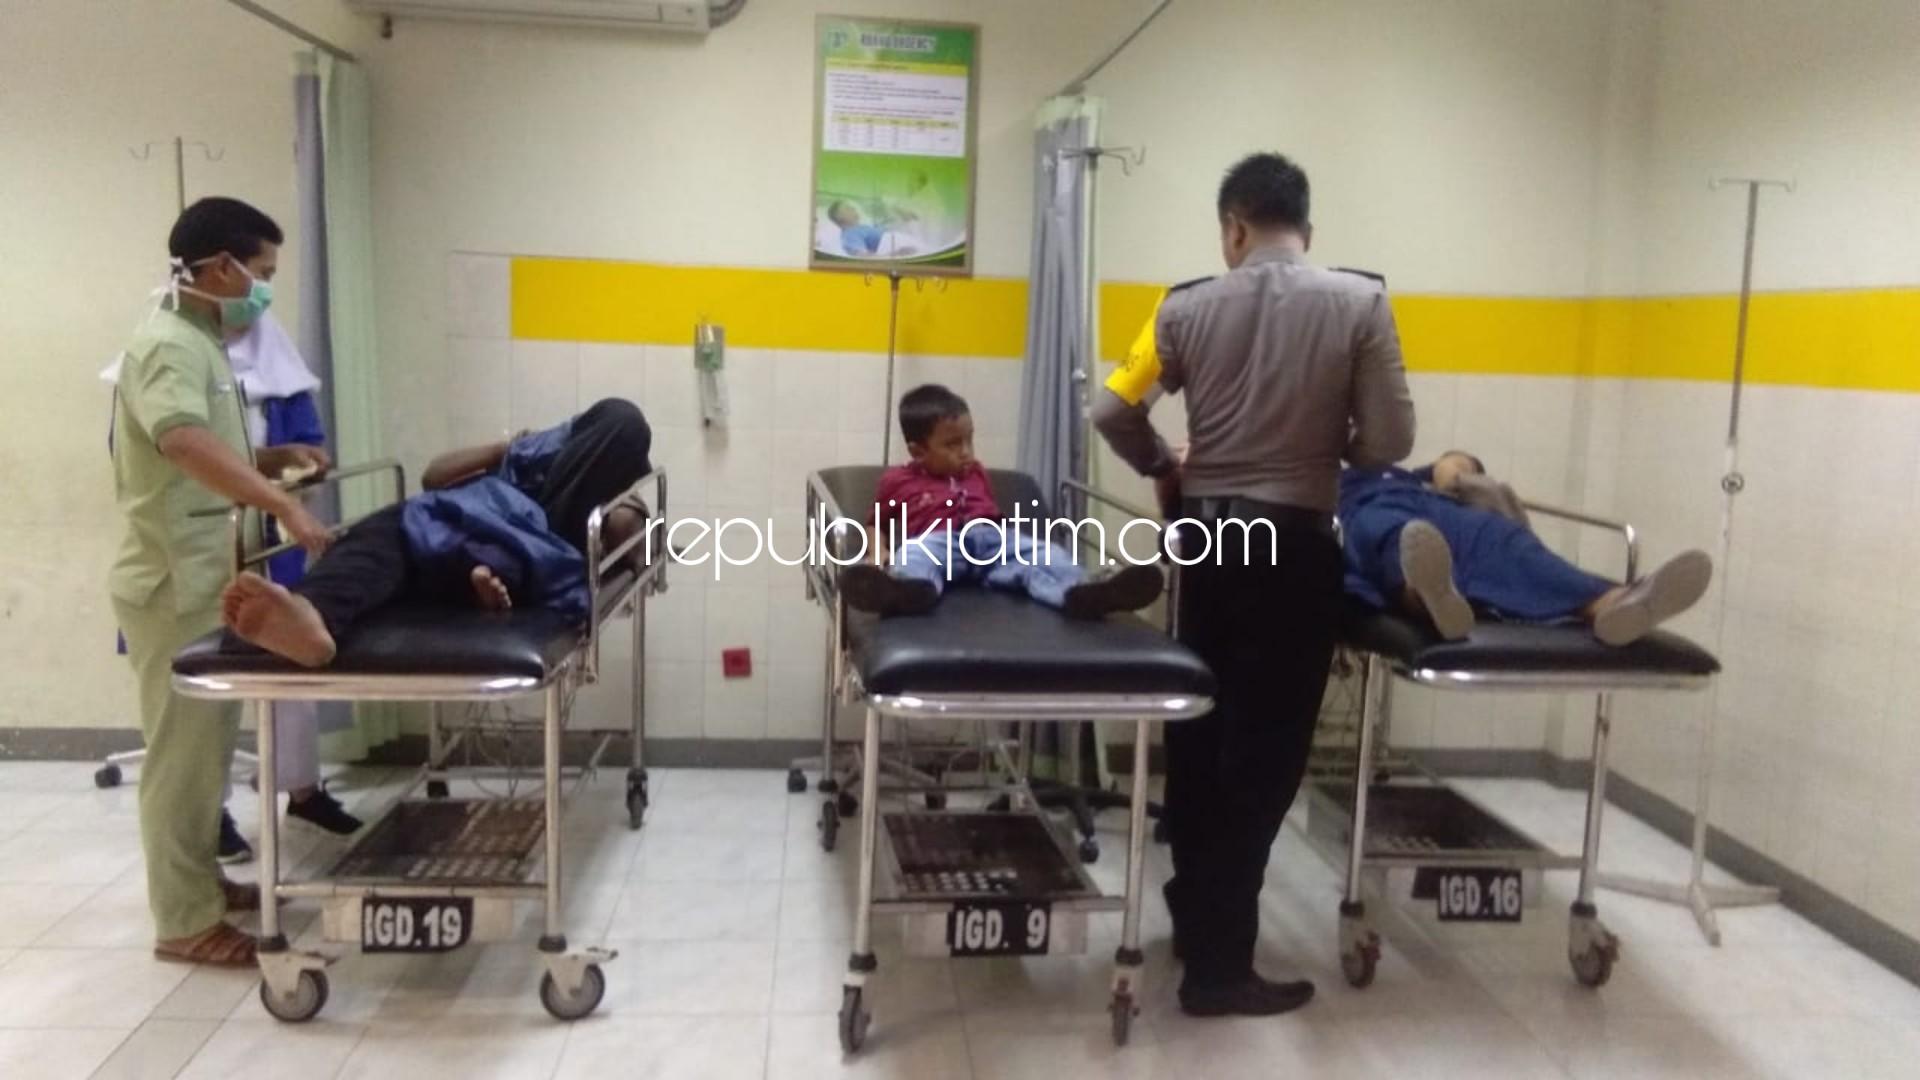 Disrempet Mini Bus, 3 Orang Sekeluarga Dirawat di RSUD Hardjono Ponorogo